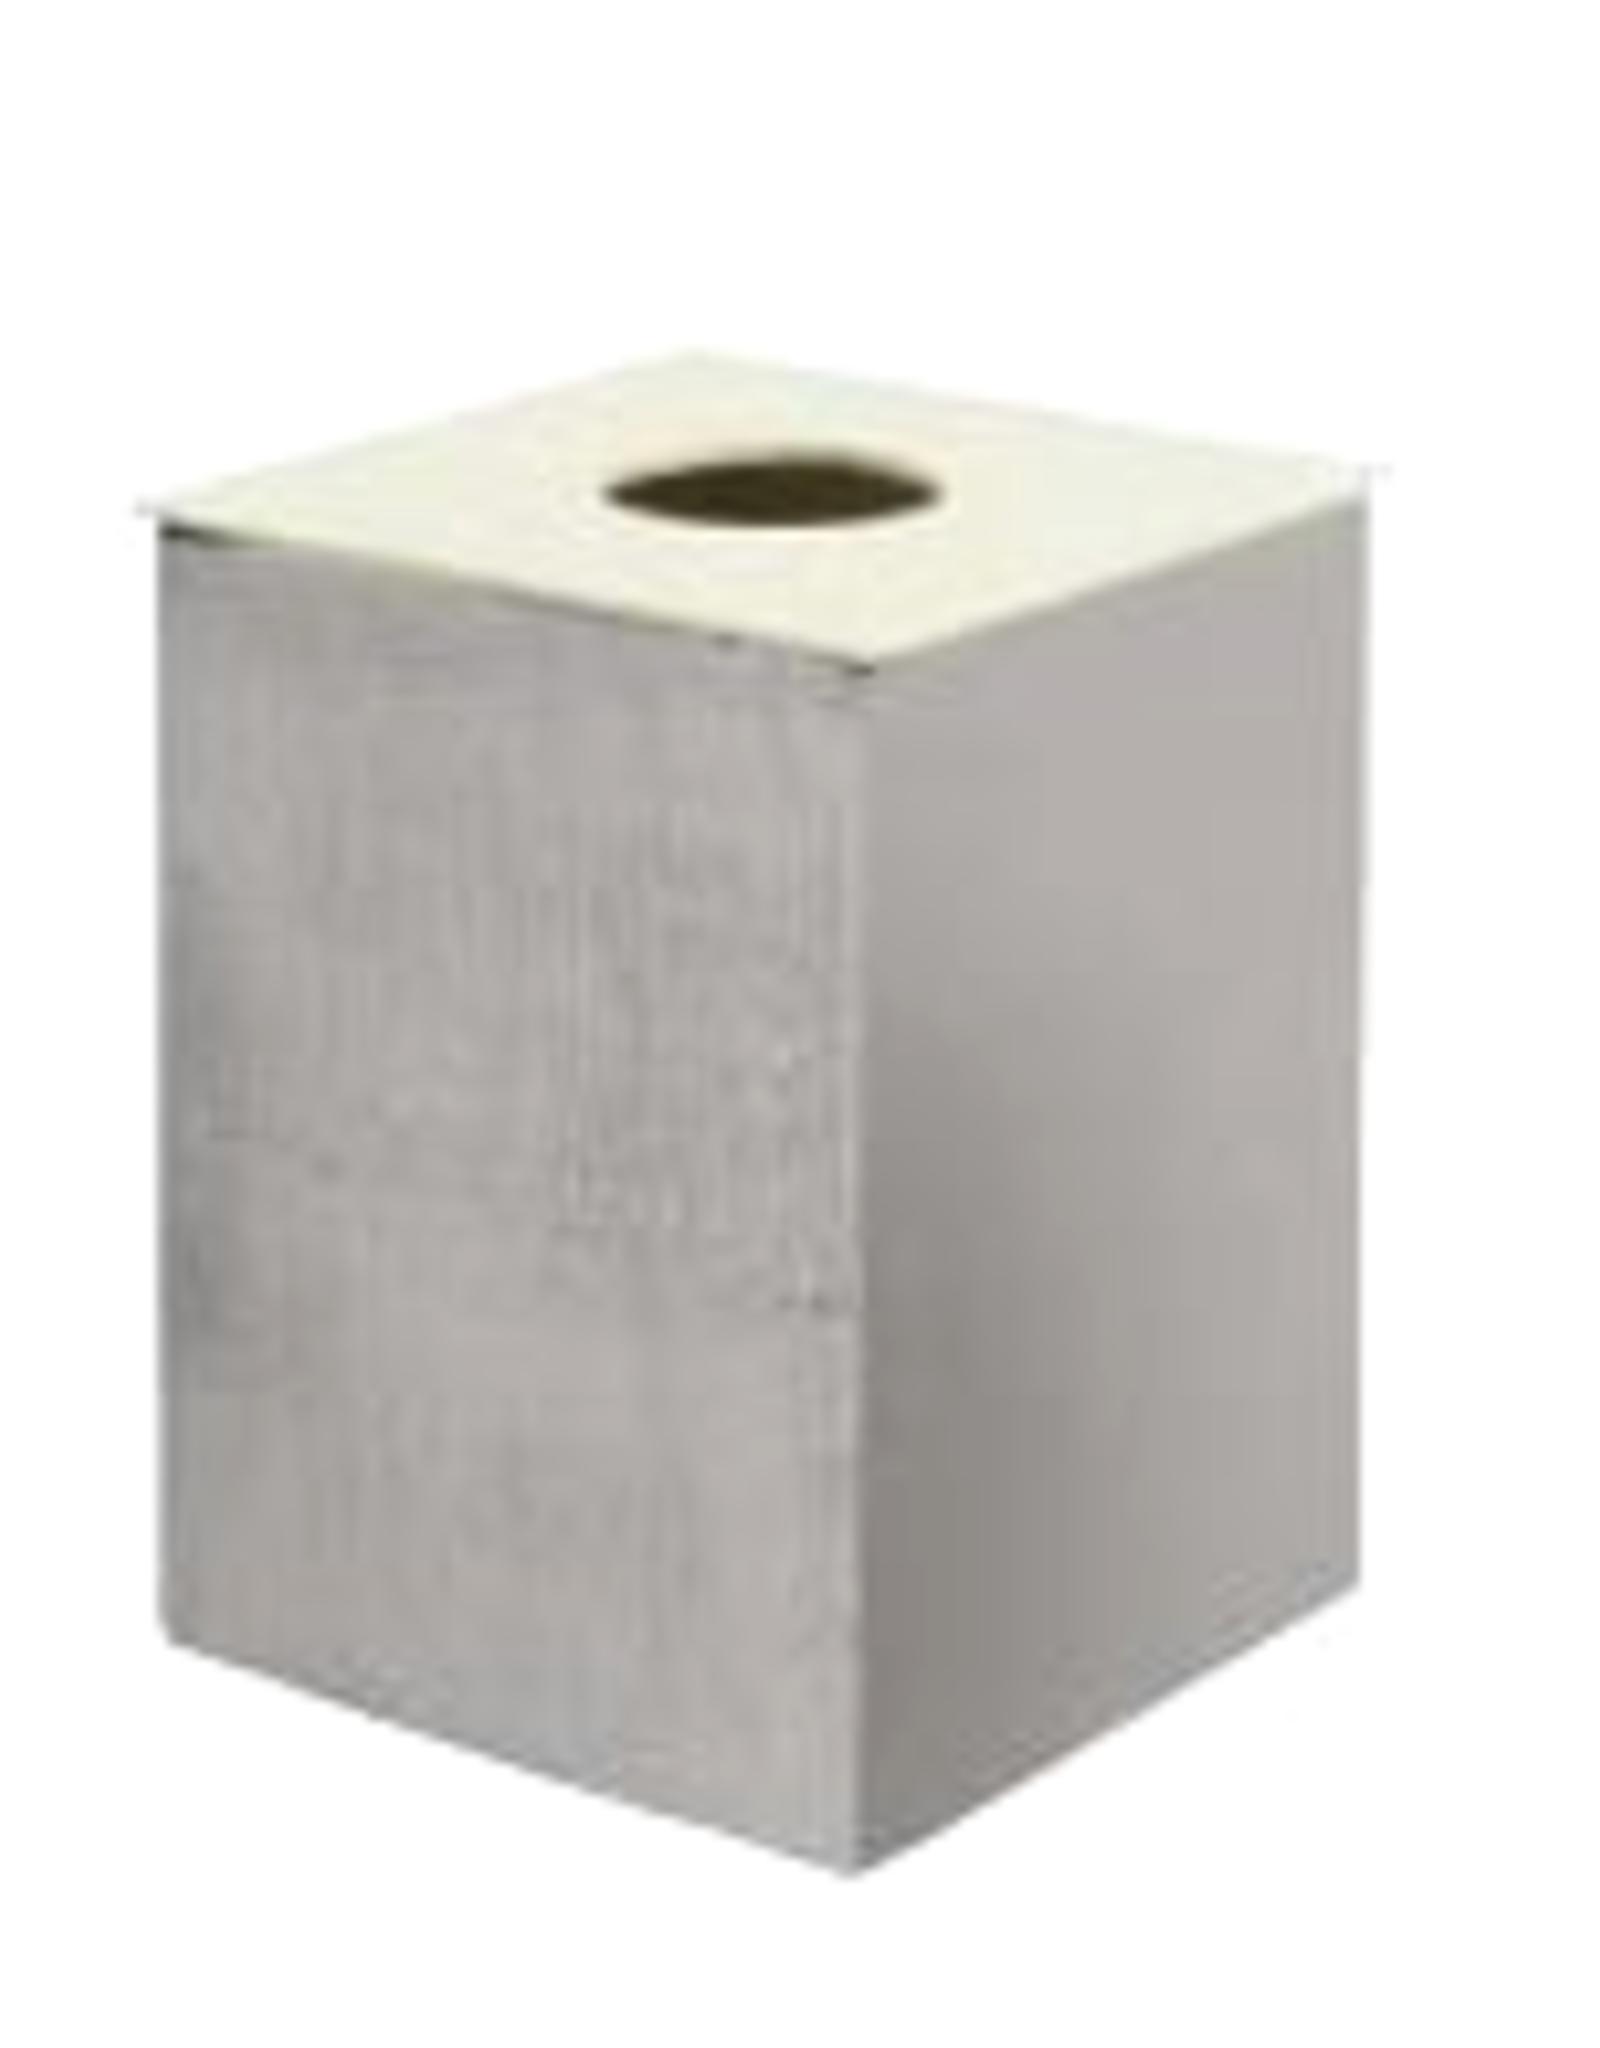 Sesti aluminium wasmand 56cm - uitverkoop